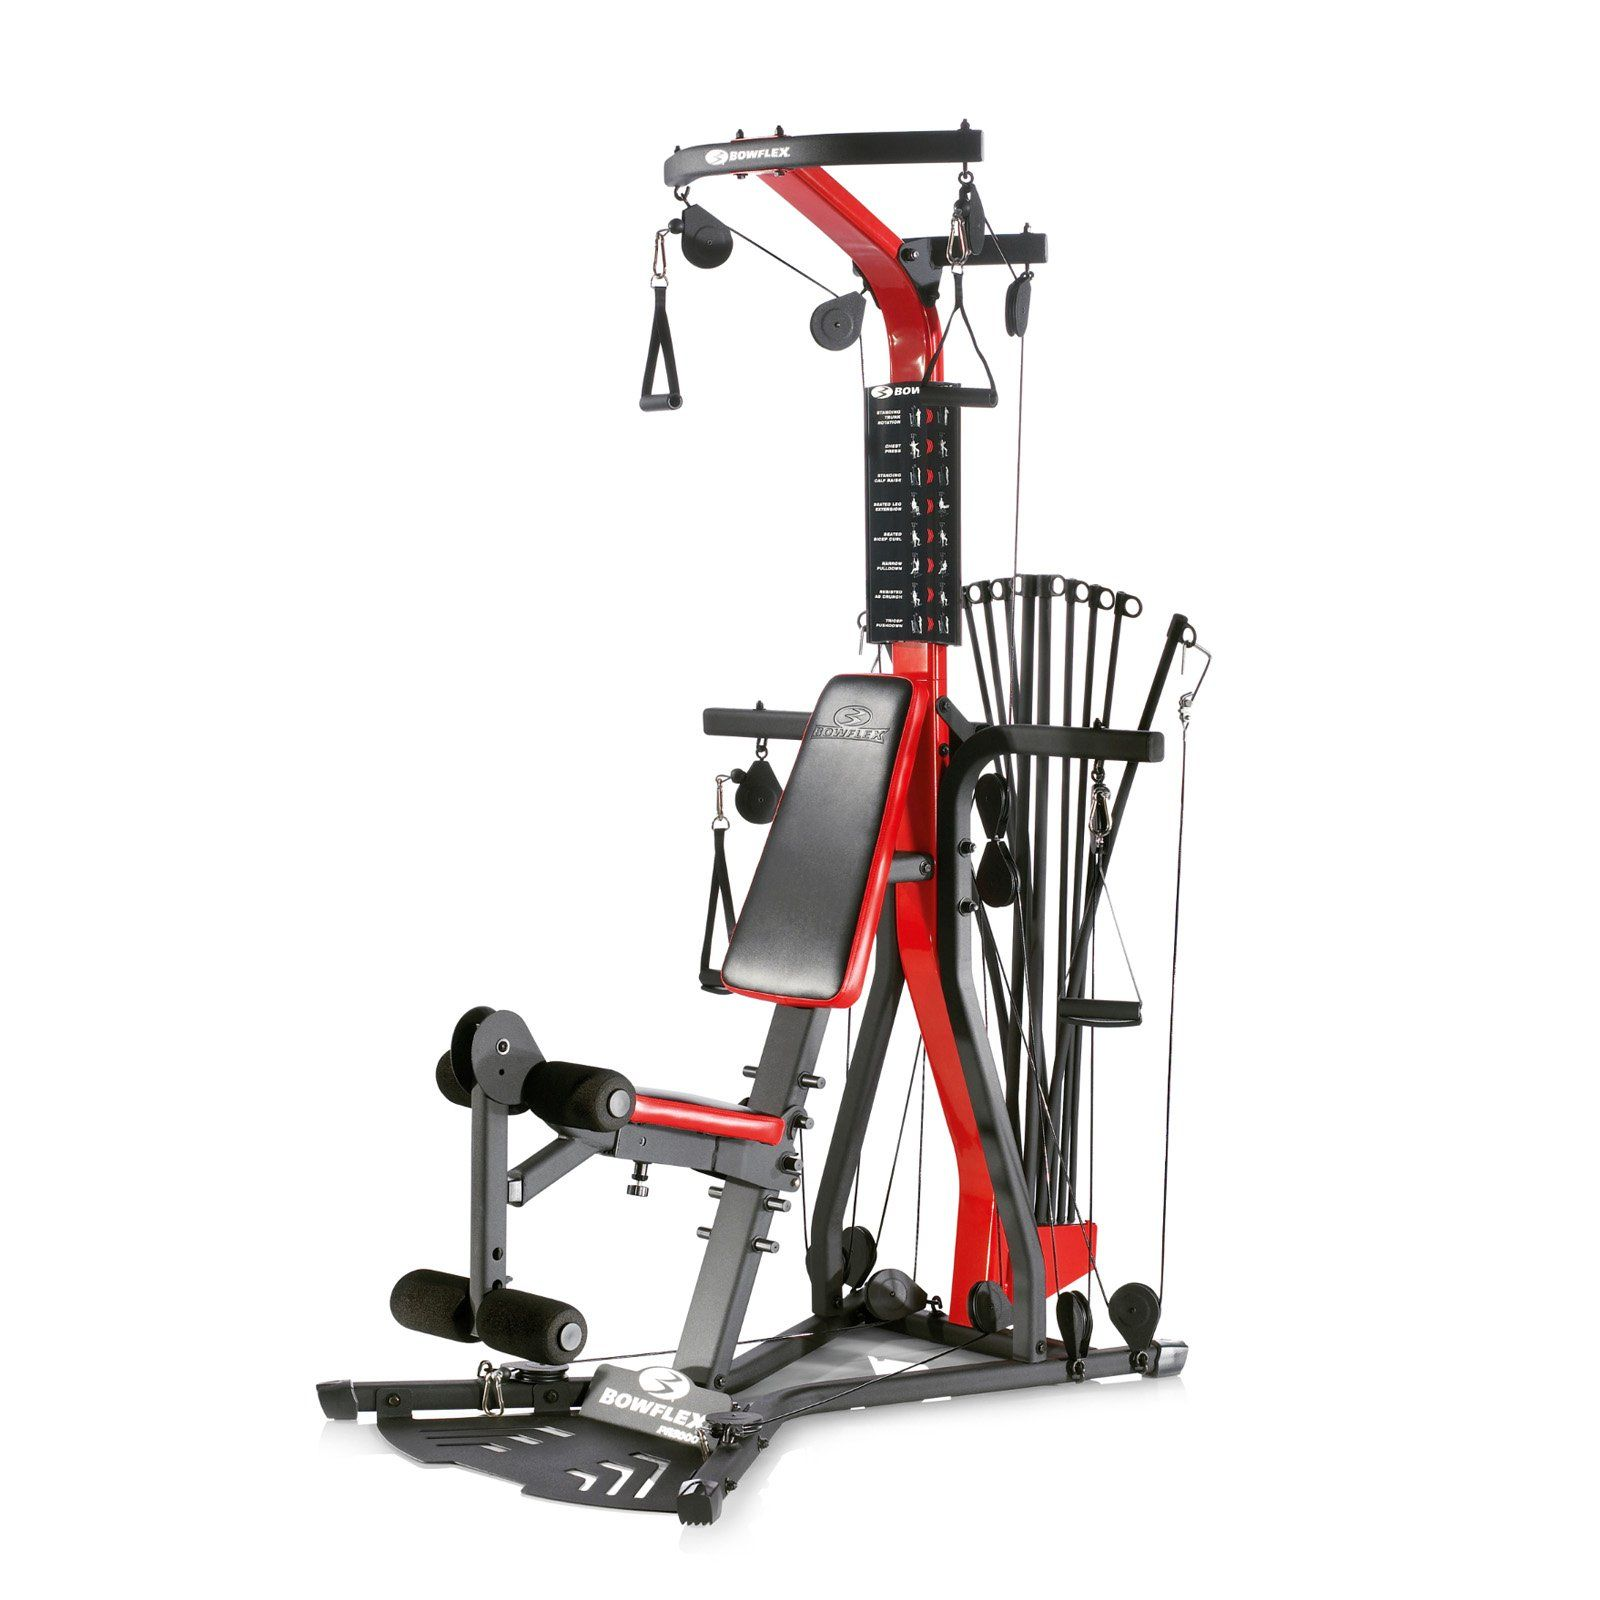 Bowflex at home gym bowflex home gym equipment